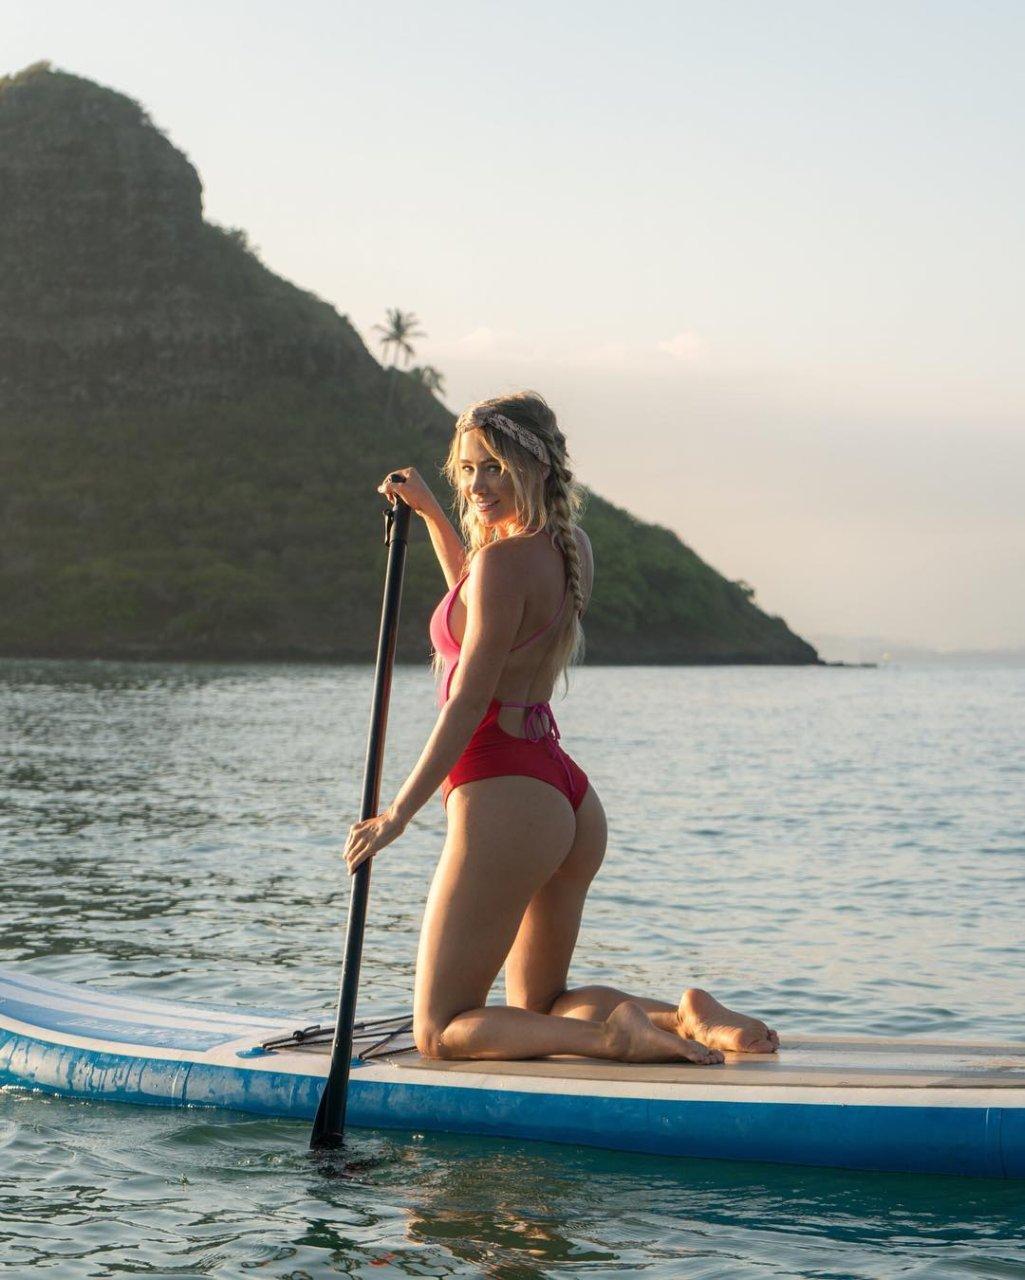 sara jean underwood nude 2017